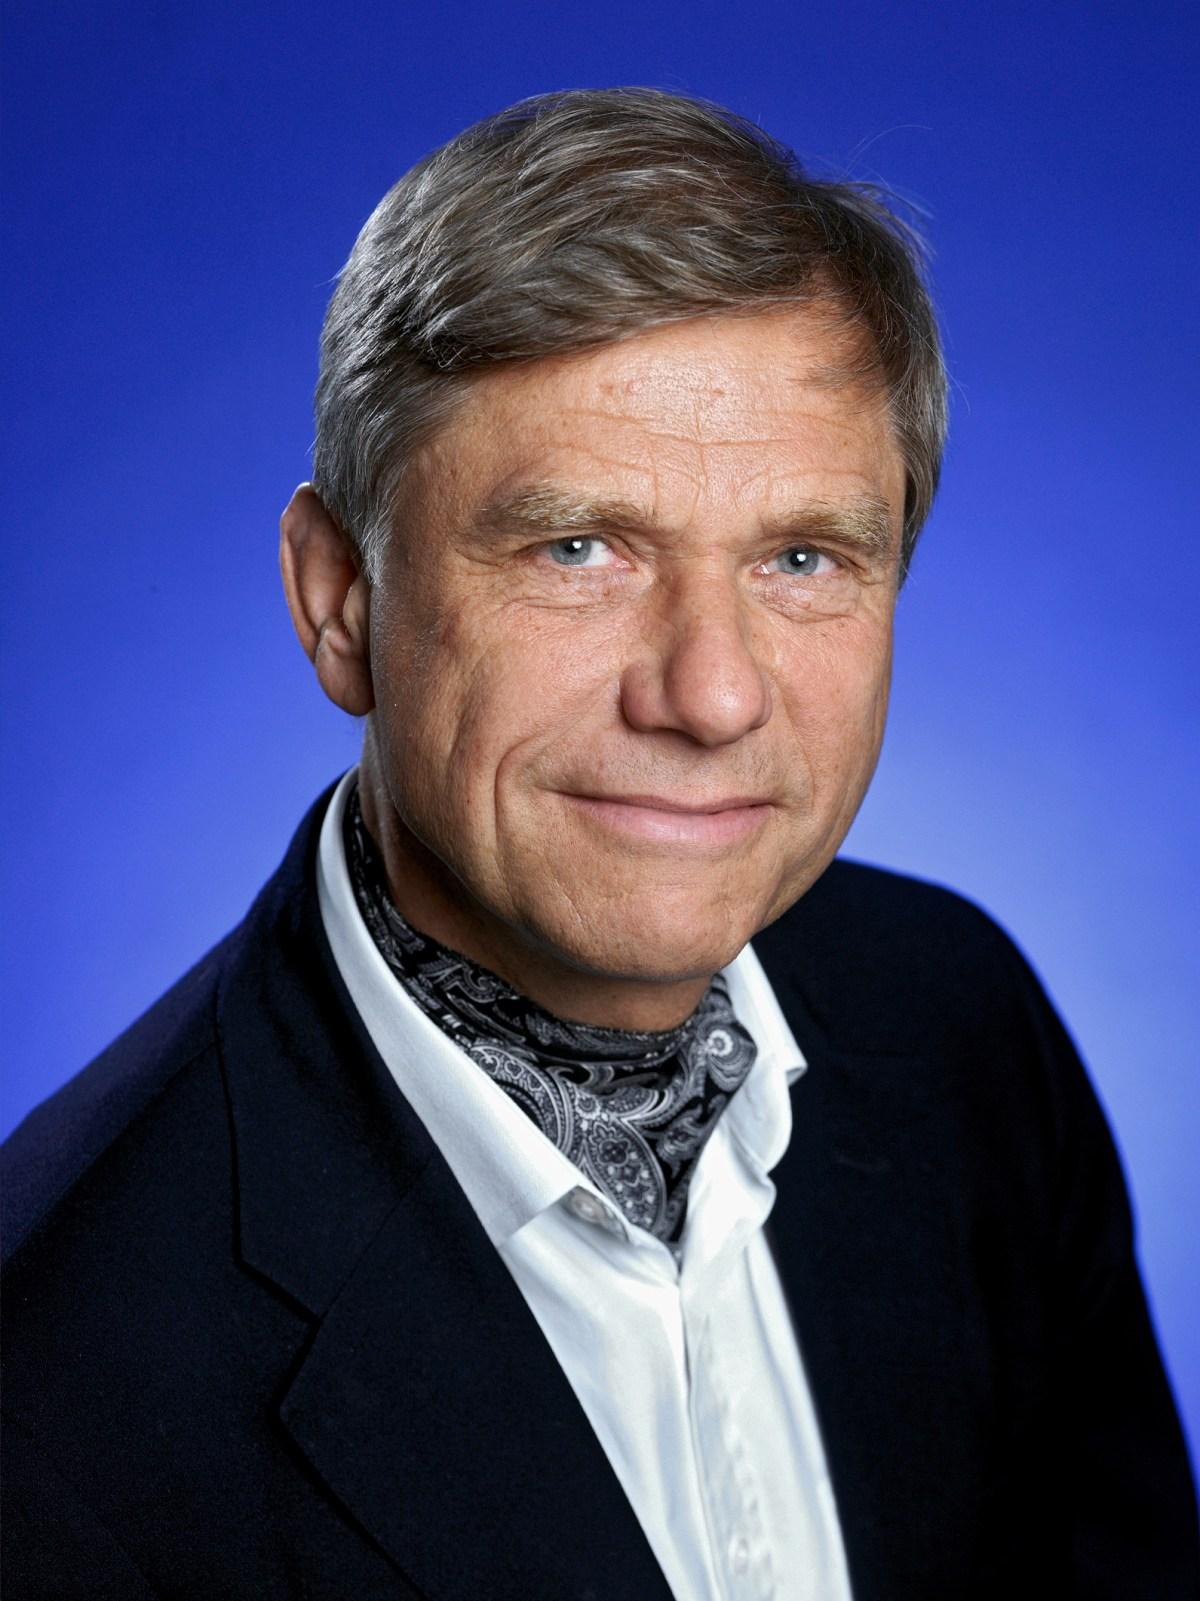 Dr. Hermann Hauser